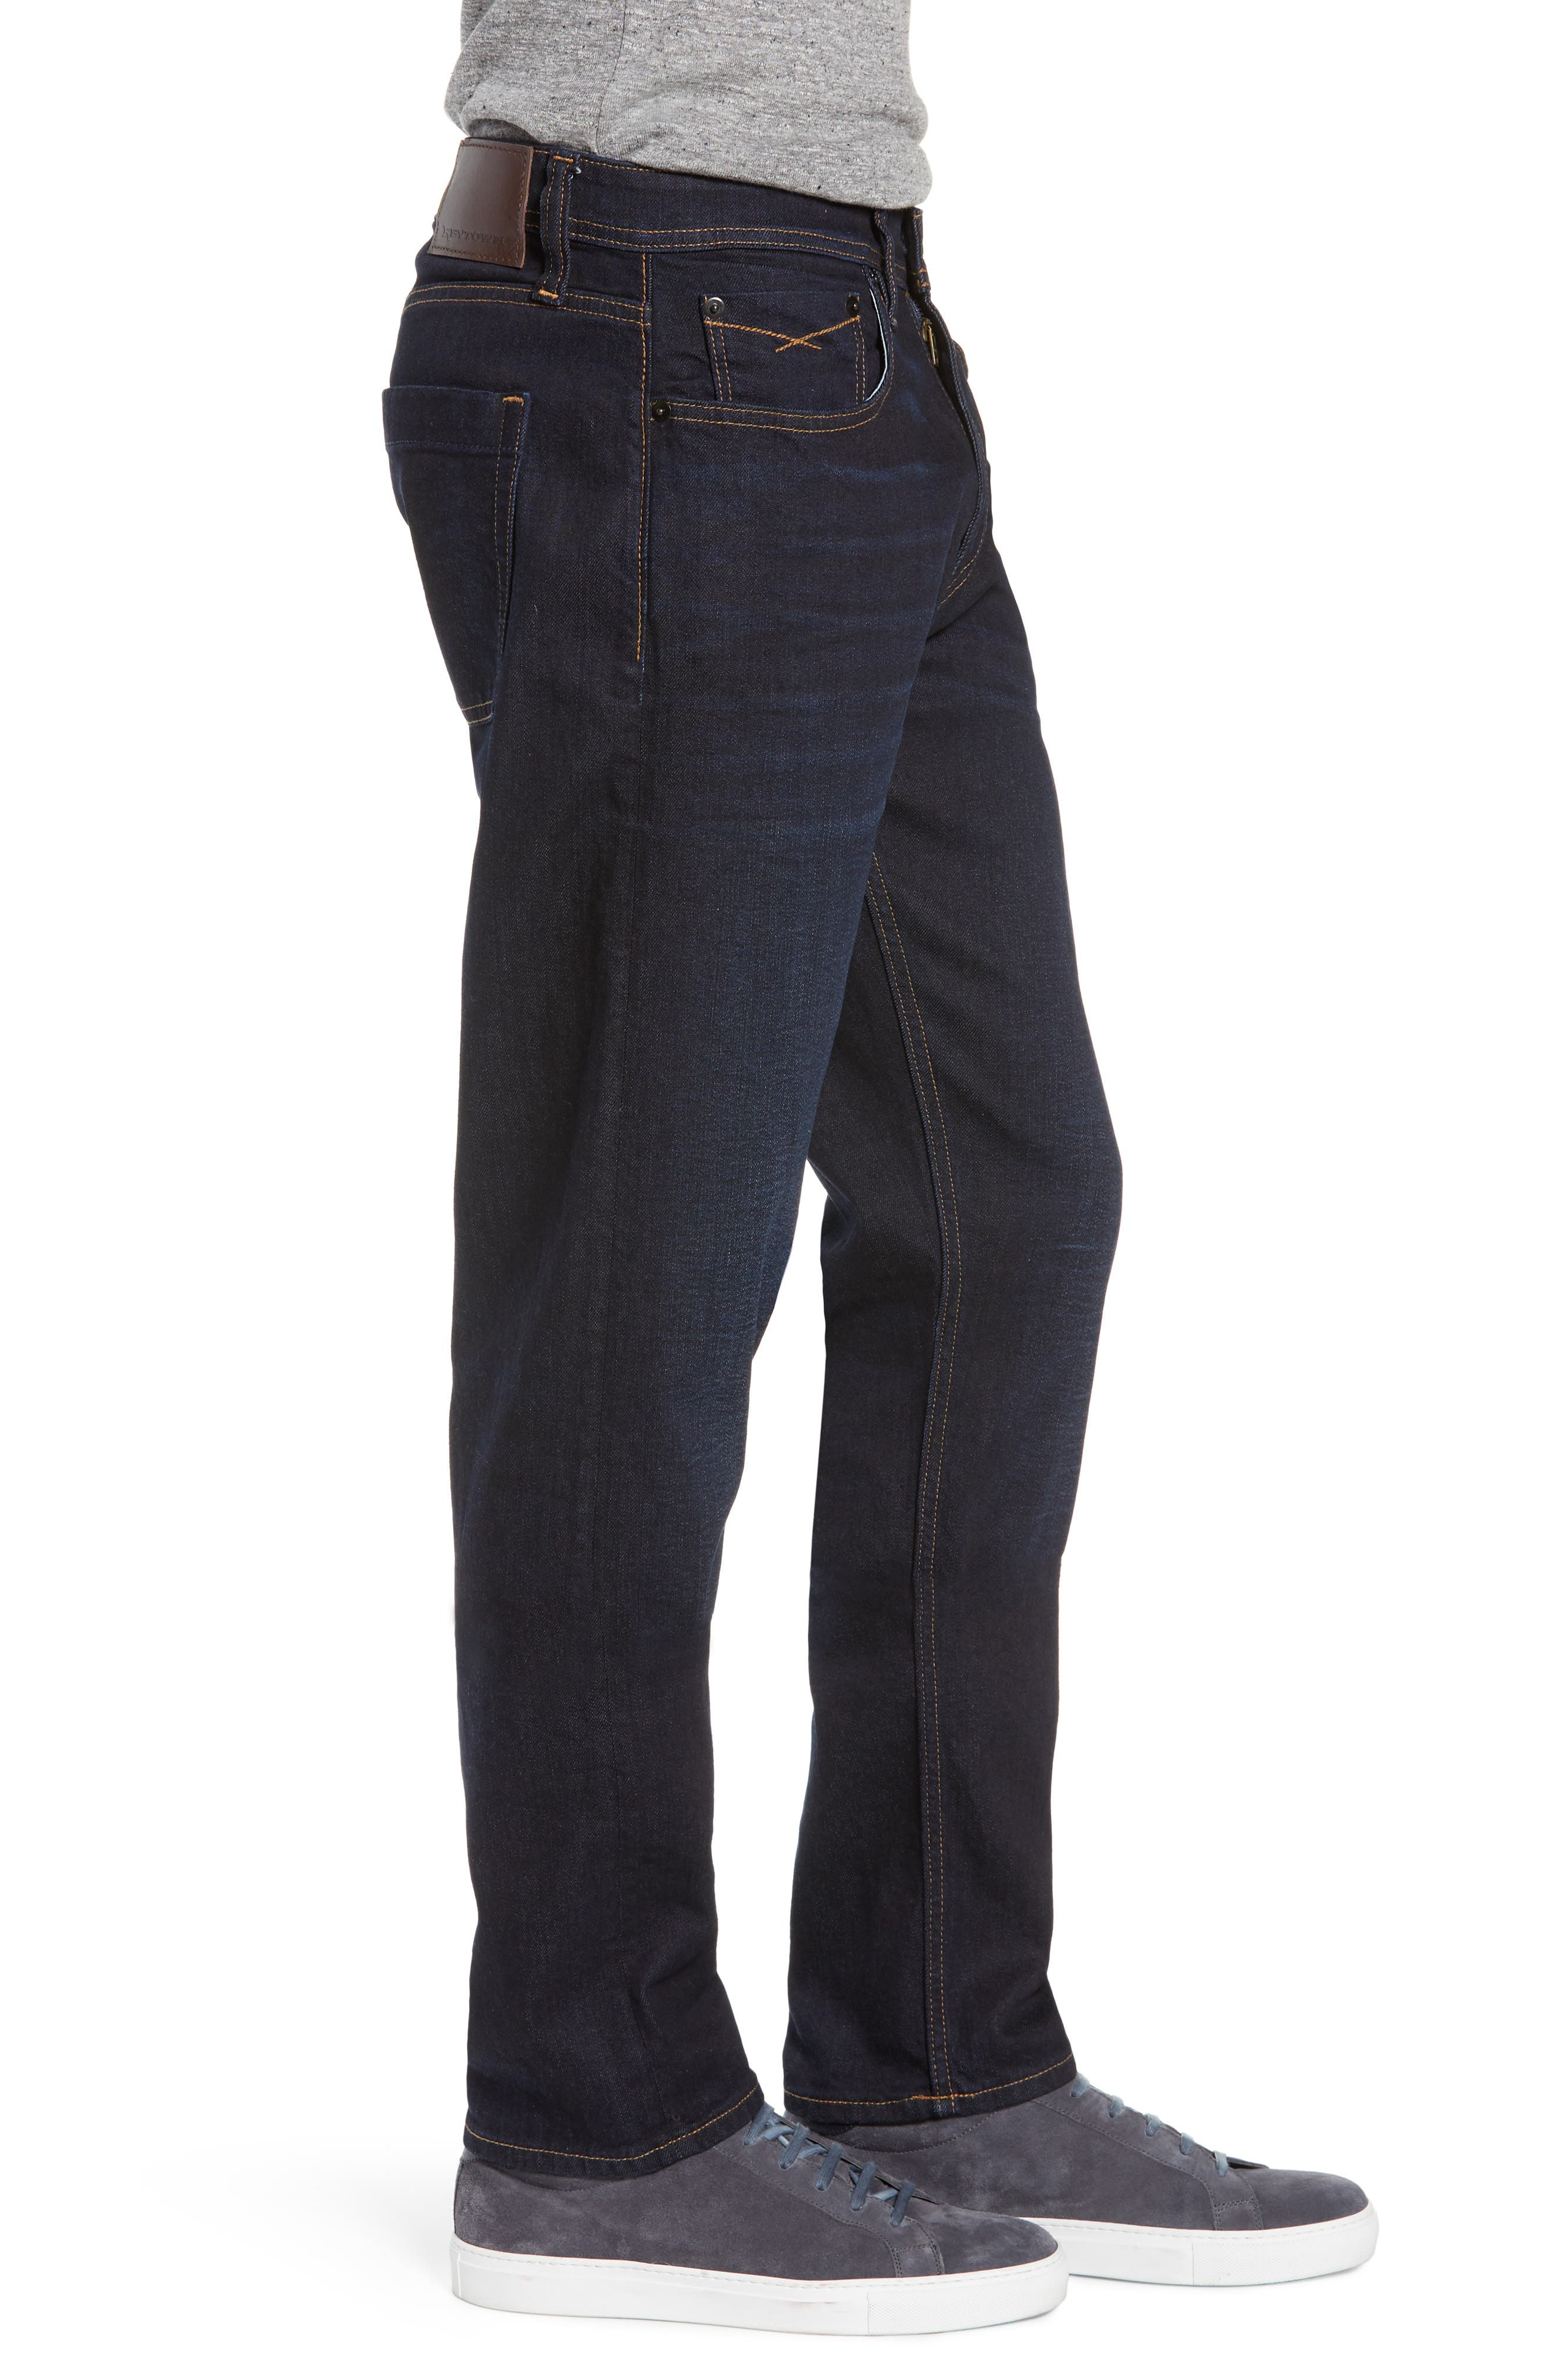 Sharp Slim Fit Jeans,                             Alternate thumbnail 3, color,                             DARK INDIGO